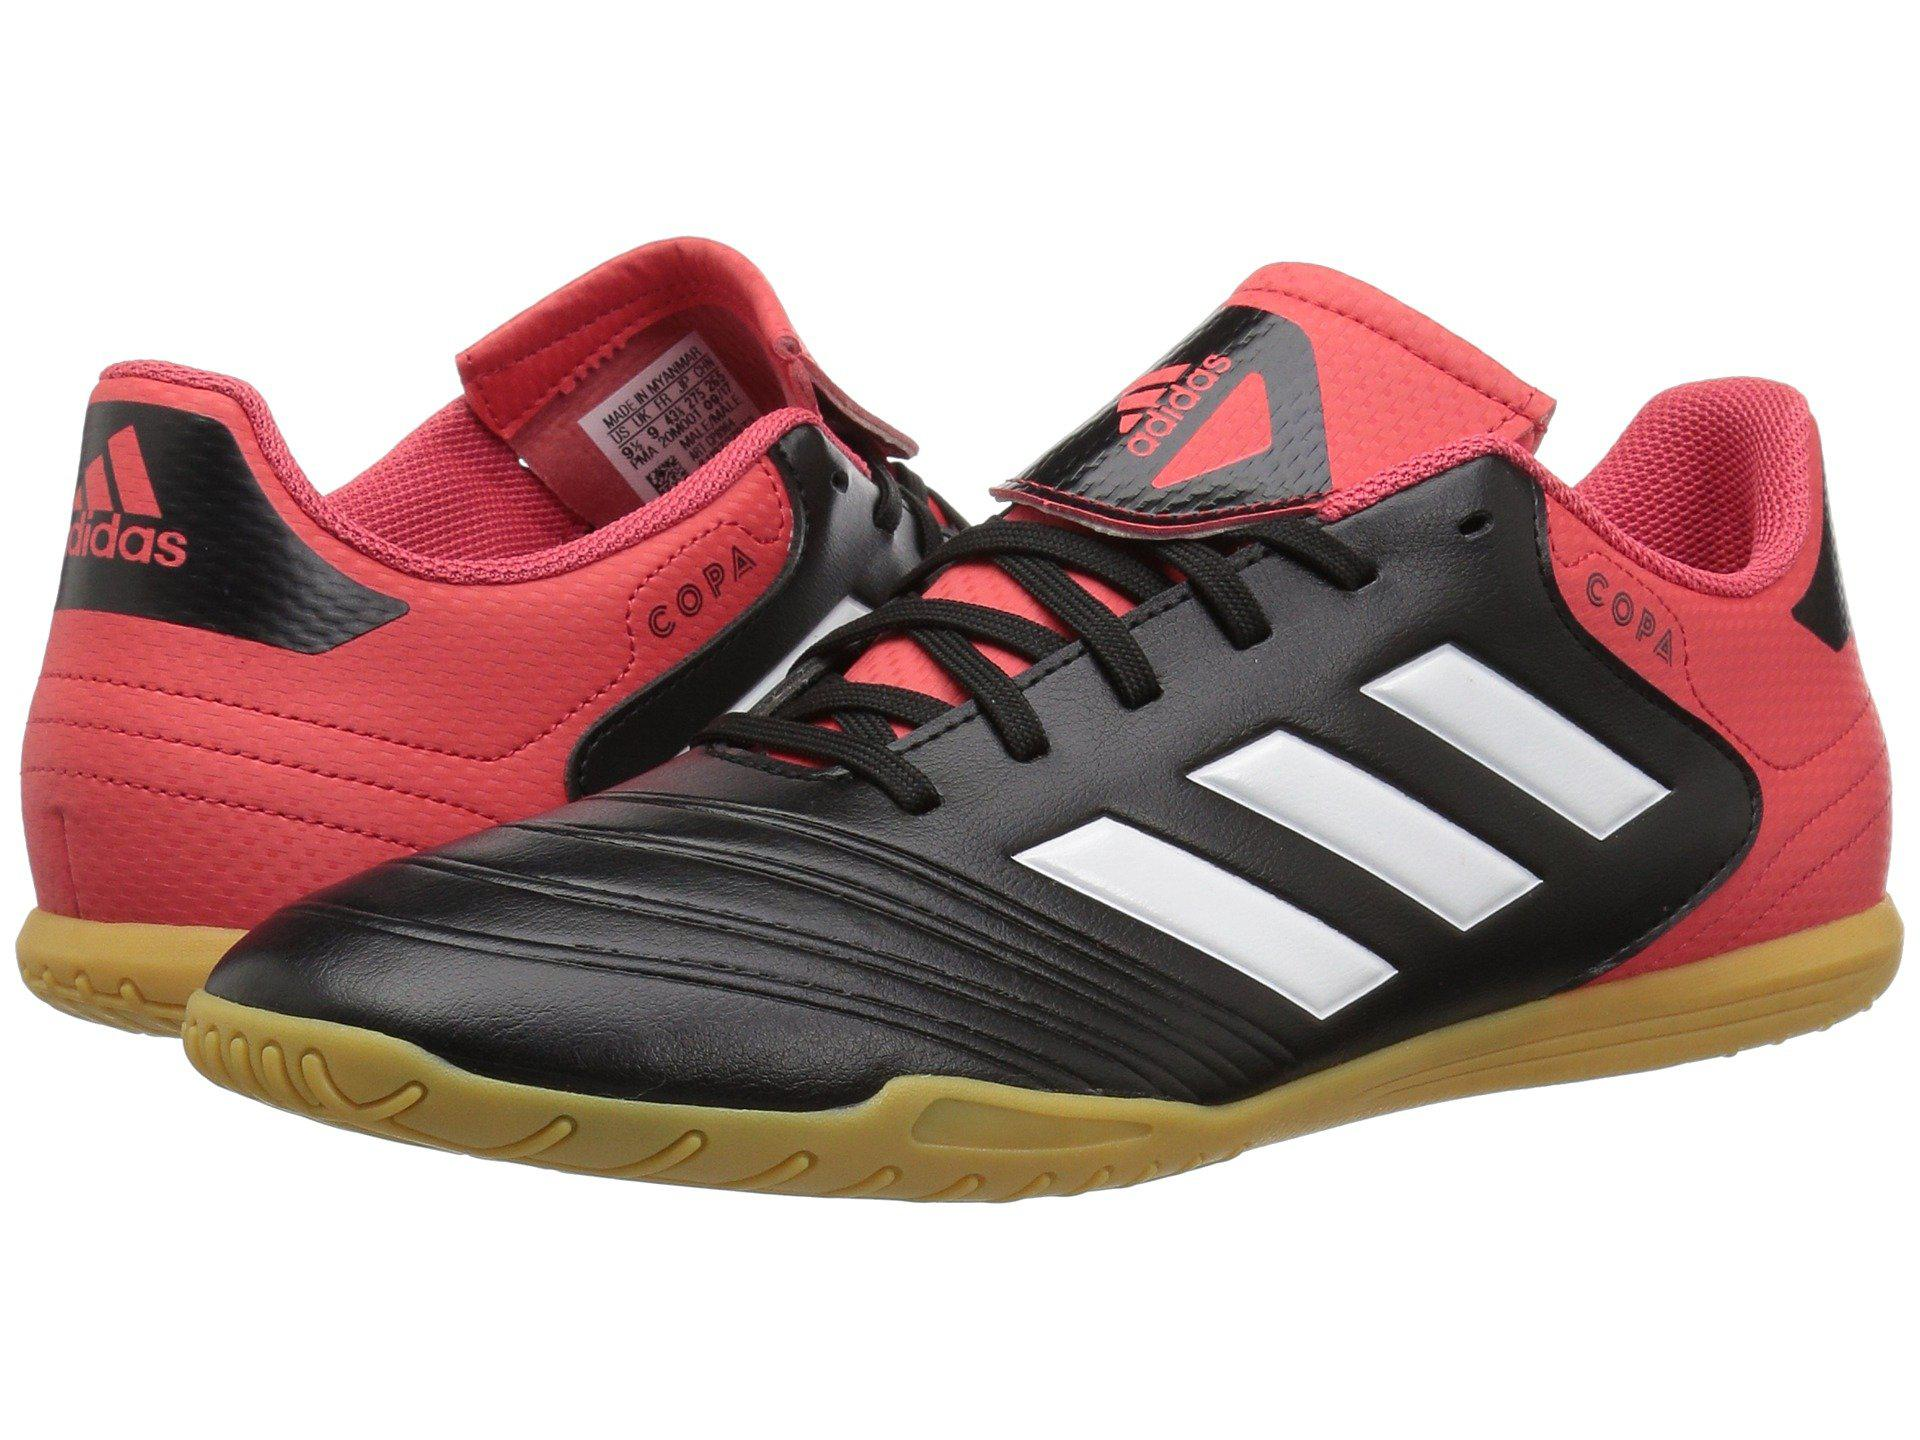 Adidas Originals Nmd Runner Black White S46883 Kids Shoes